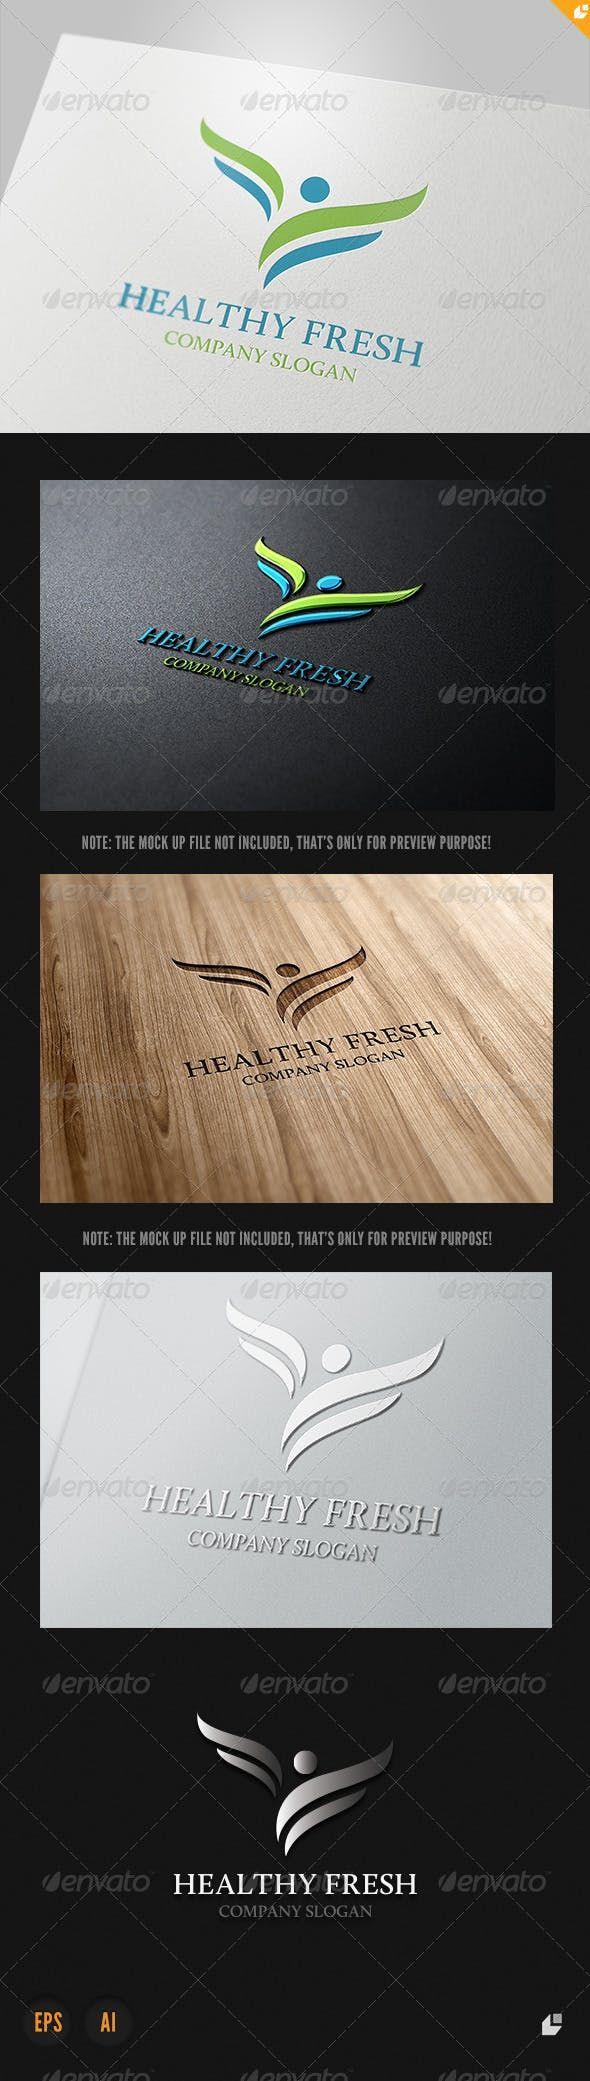 Healthy Fresh Logo — Vector EPS wellness business